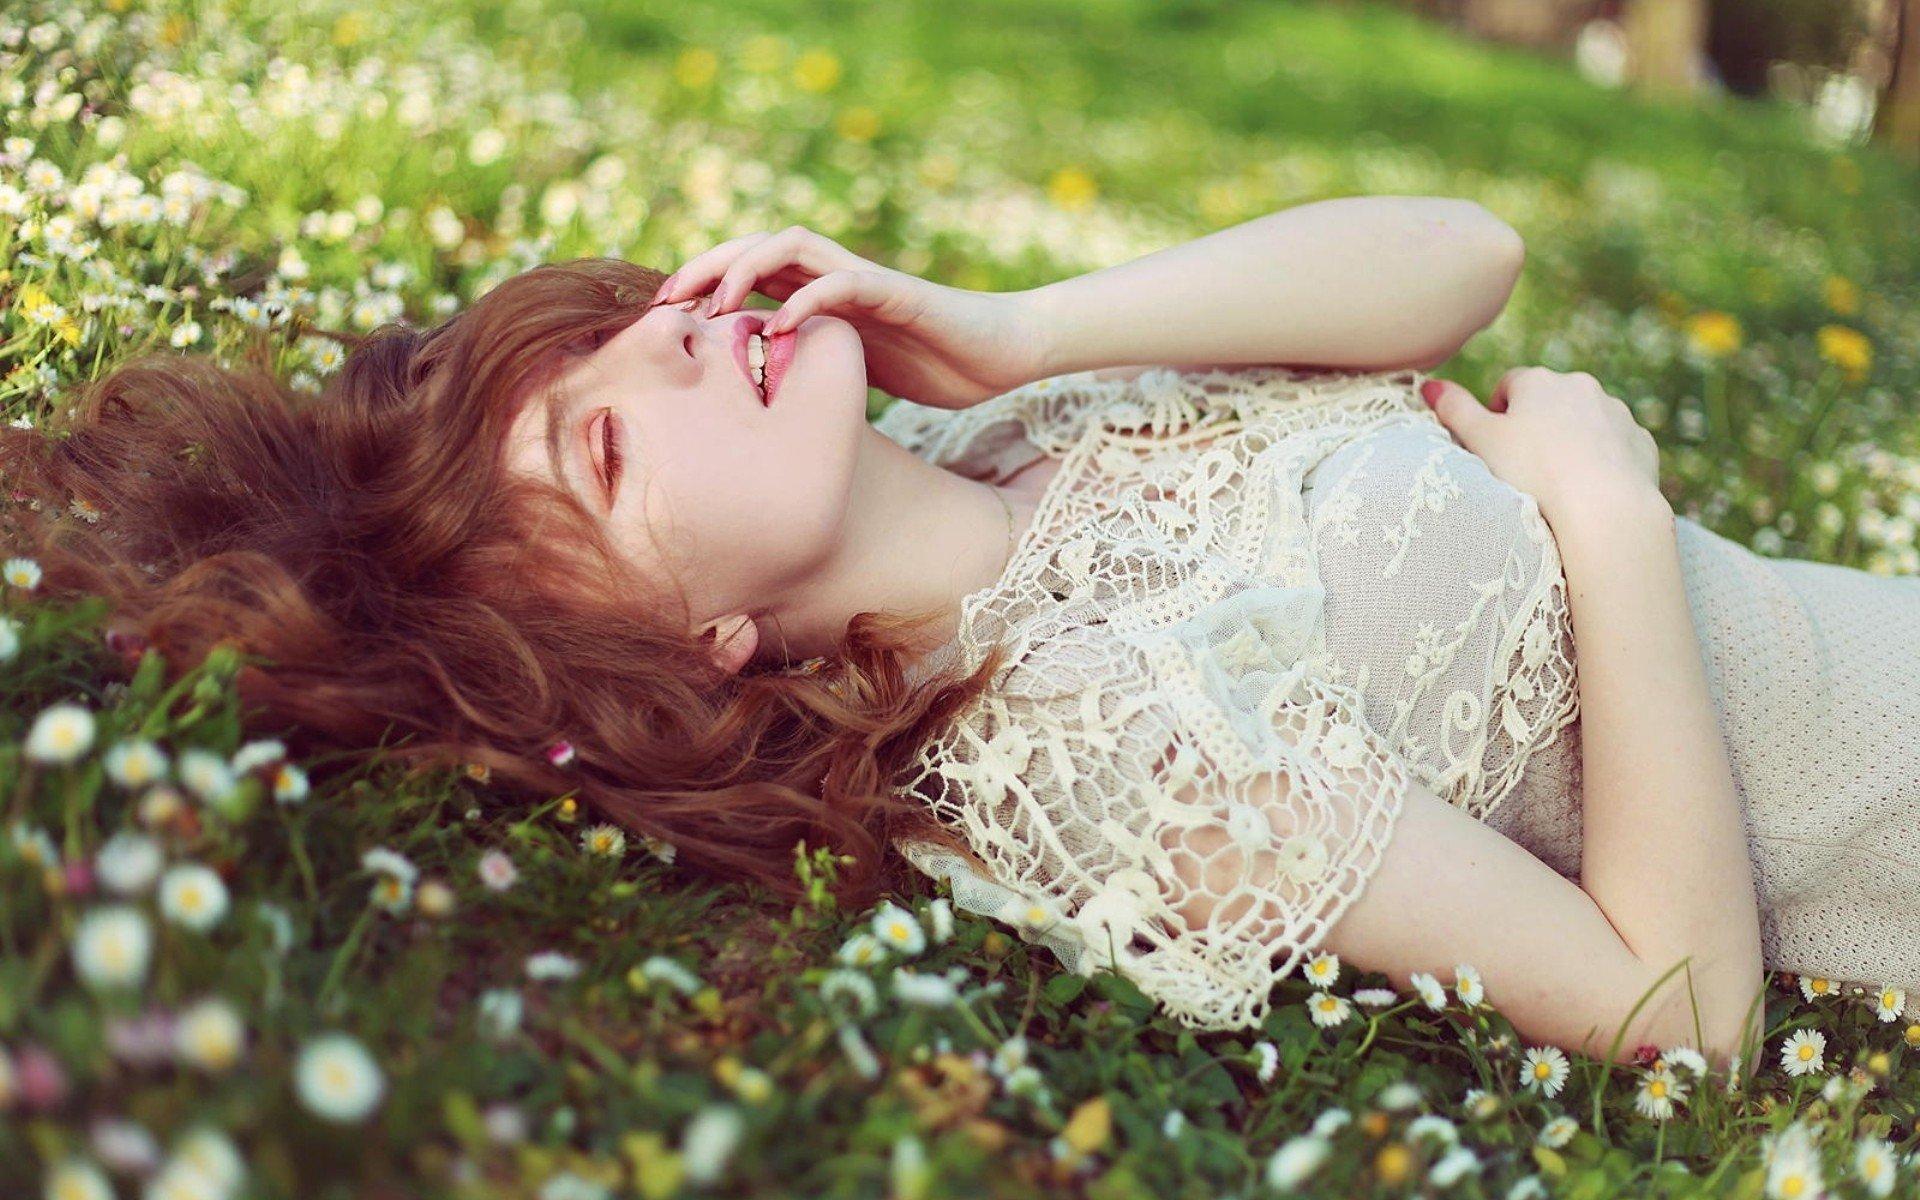 women, Lying down, Closed eyes, Auburn hair, Flowers, Grass Wallpaper